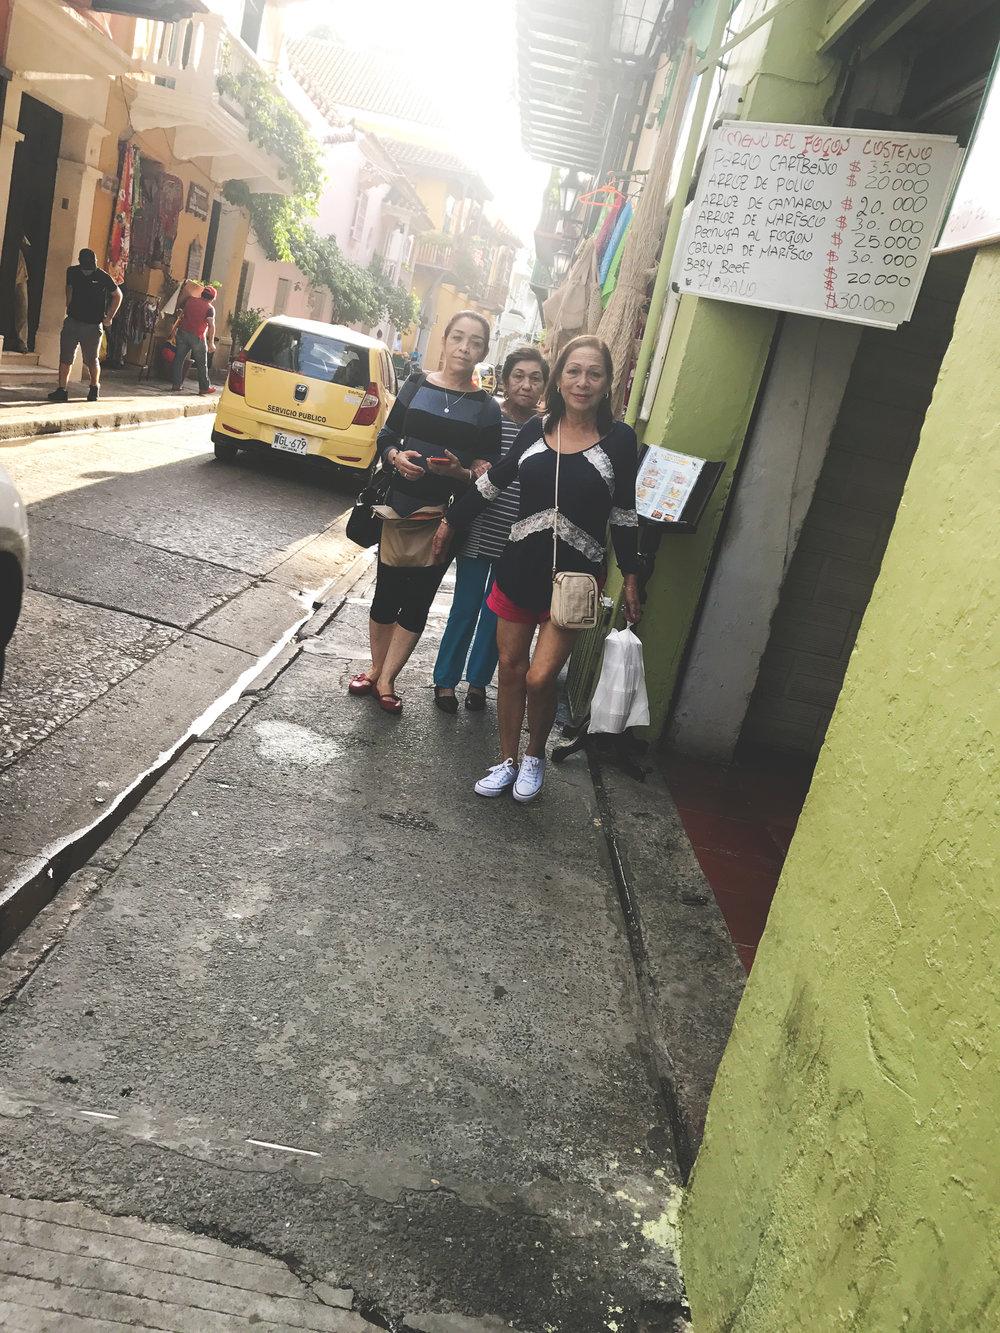 2017-Cartagena-LowRes-25.jpg